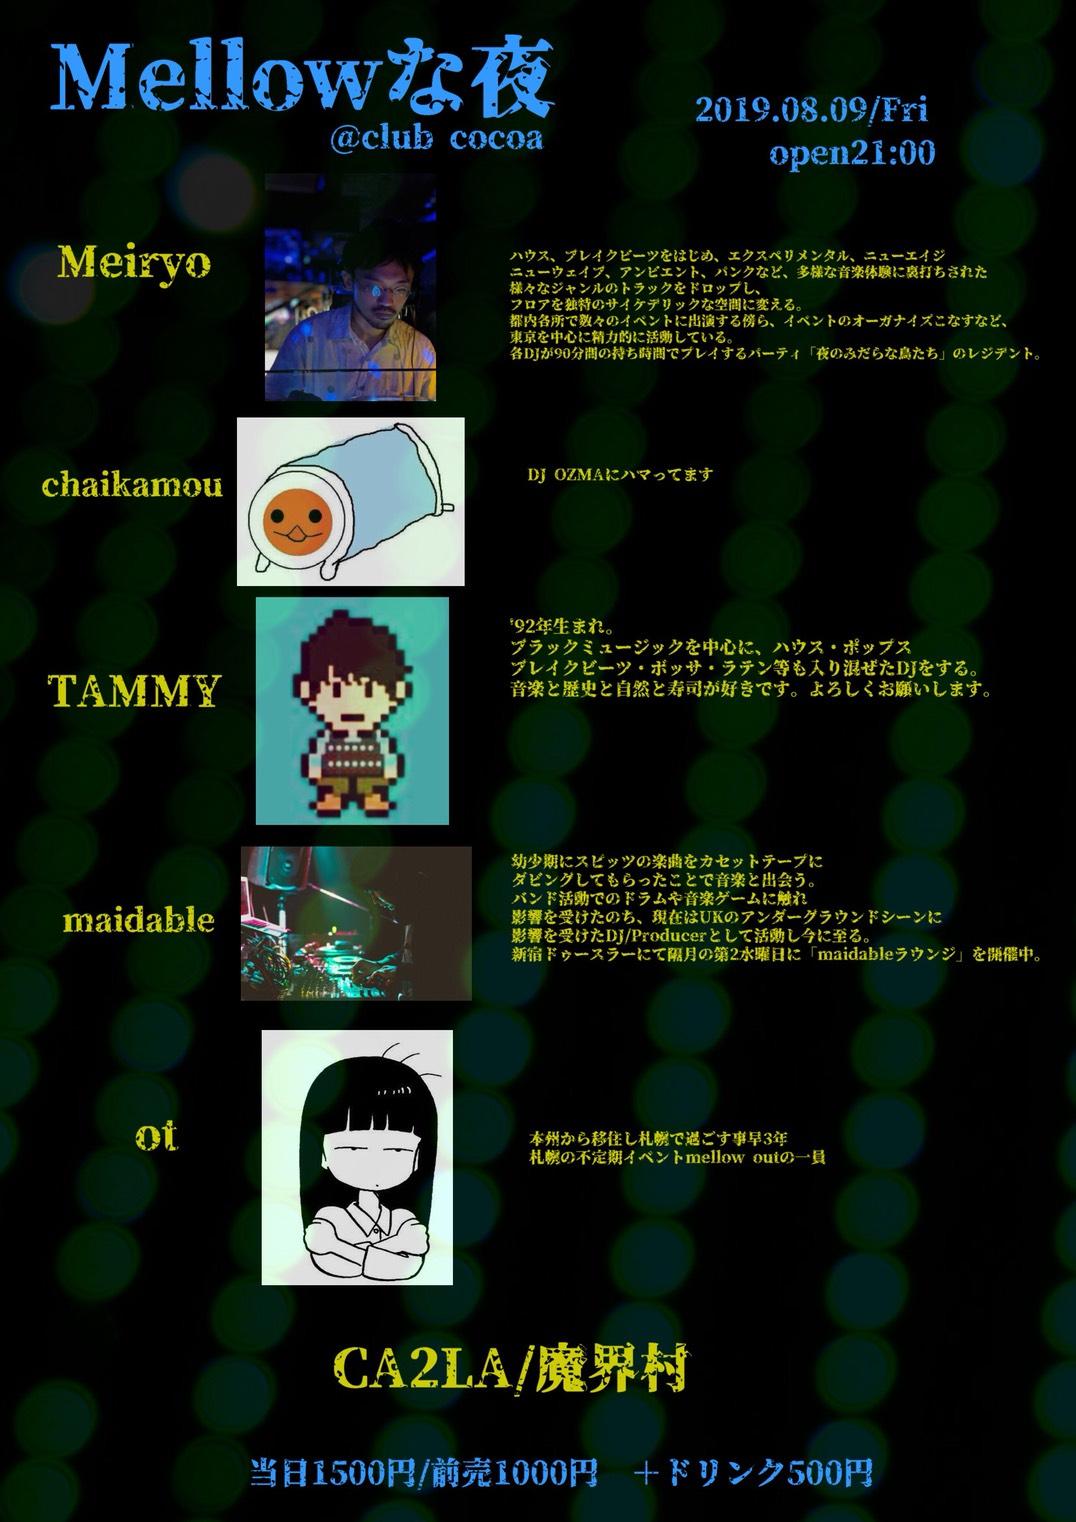 Mellowな夜 (City Pop) @ 函館 Club COCOA